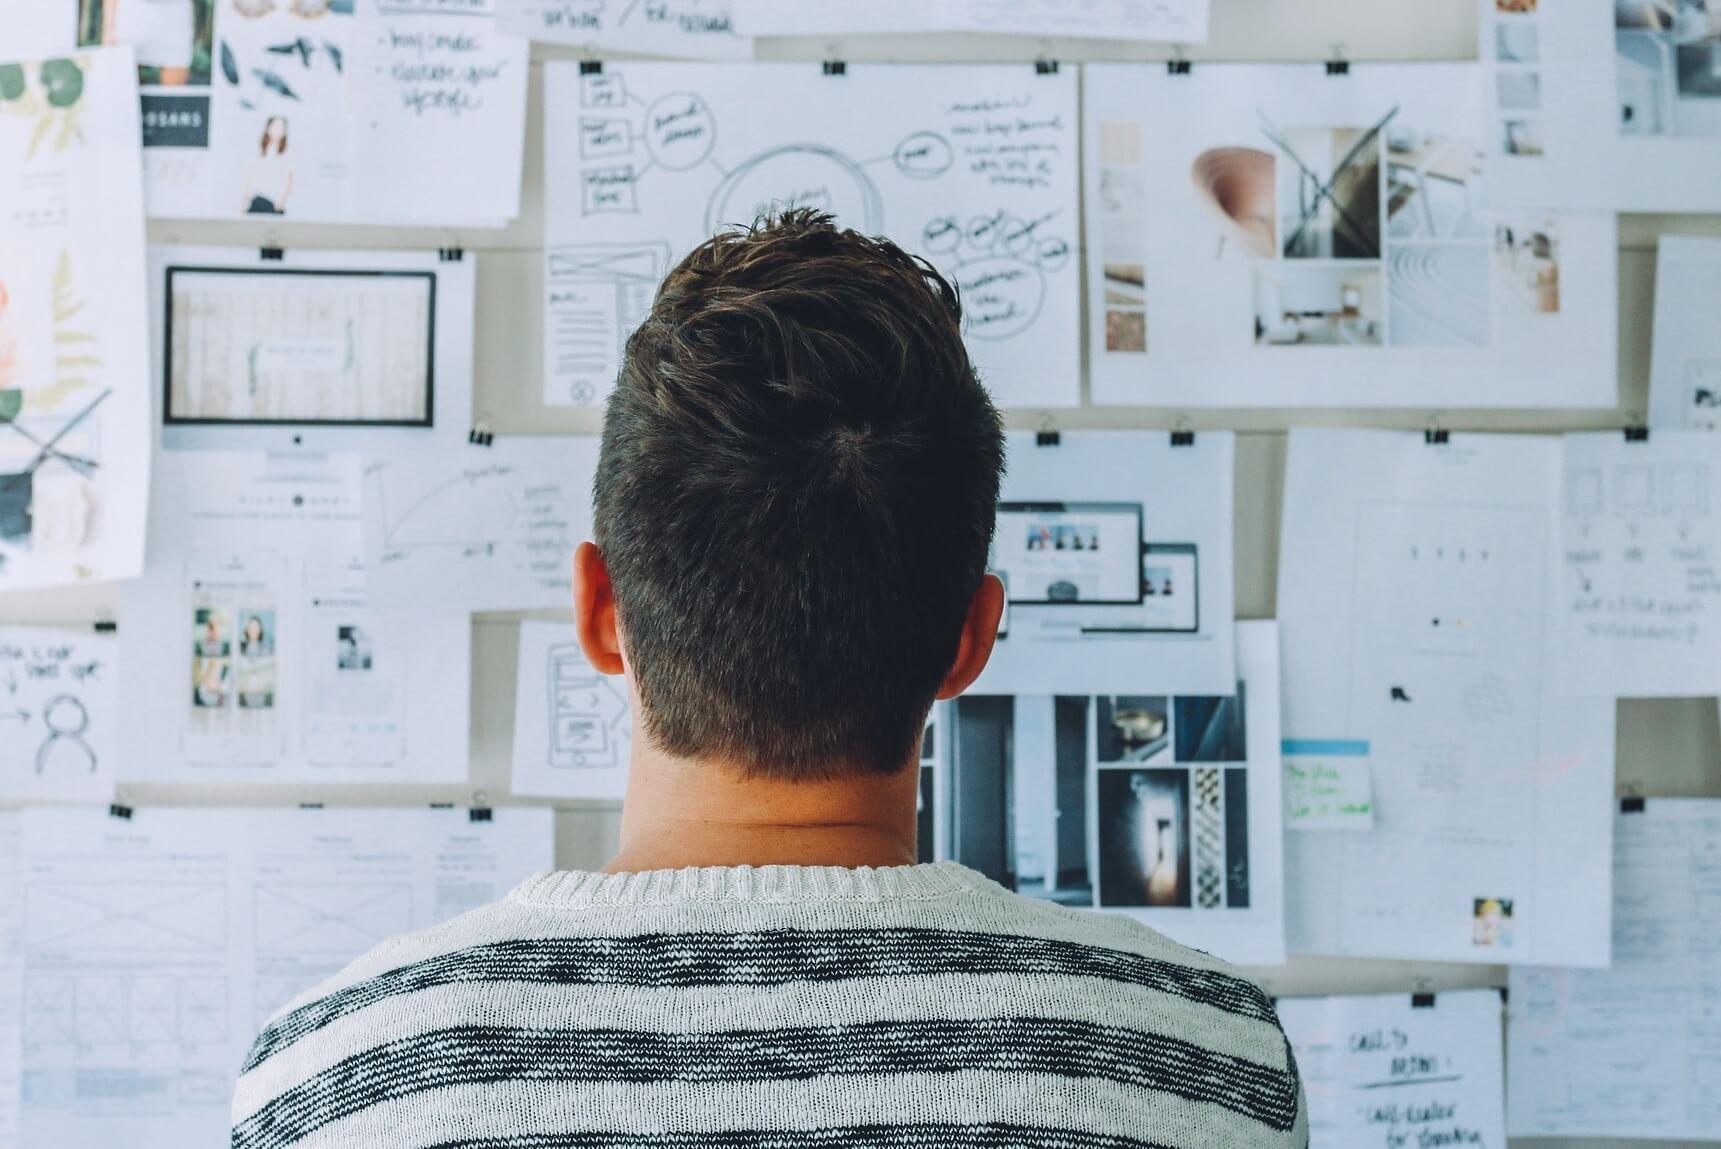 frim fesr lombardia ricerca sviluppo brevetti imprese pmi giovanili